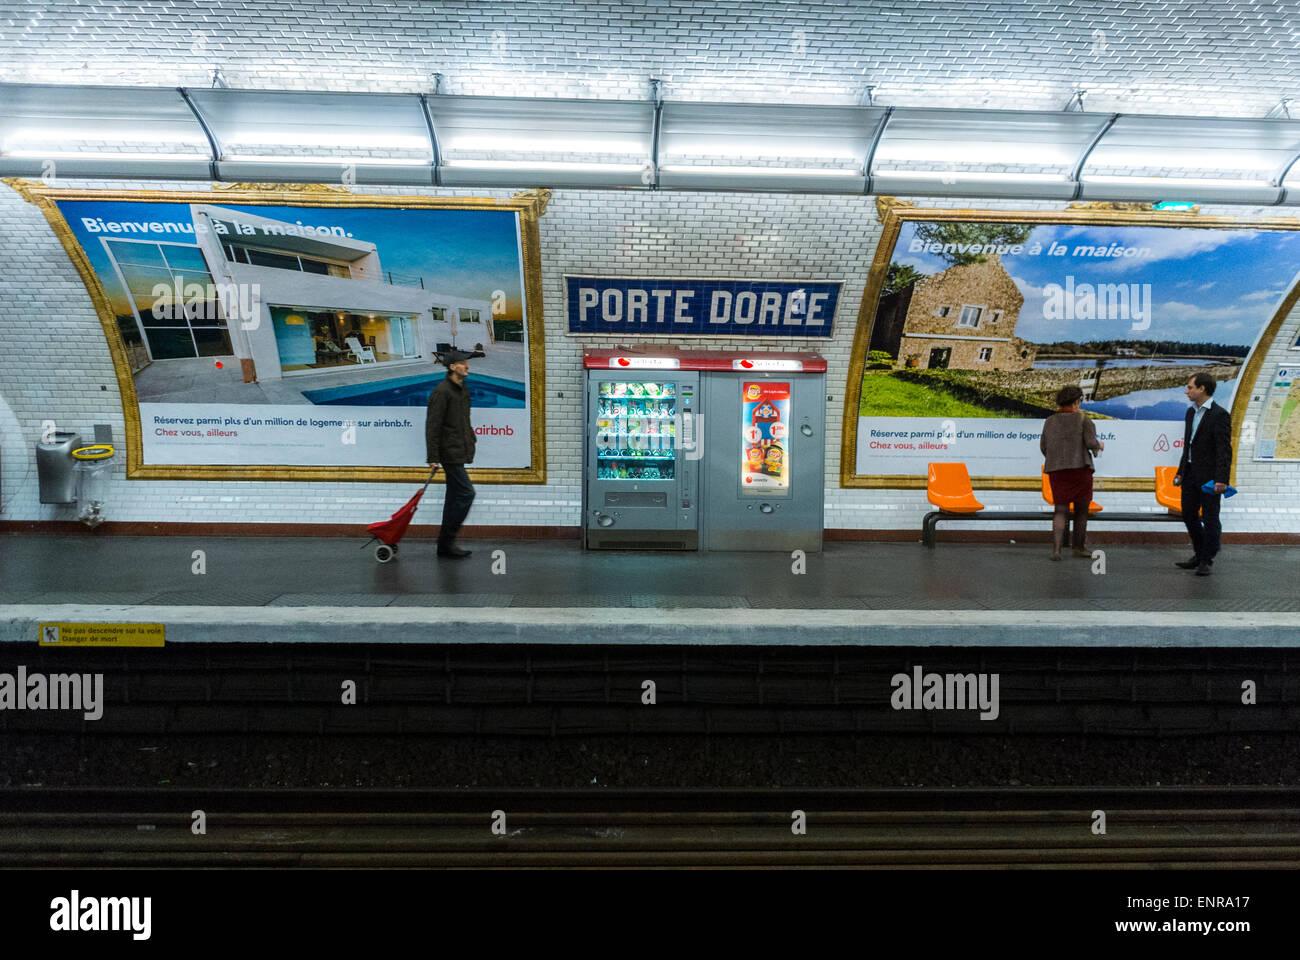 Paris, France, People on Platform inside Metro Underground Subway Station, Porte Doree with French Advertising Poster Stock Photo